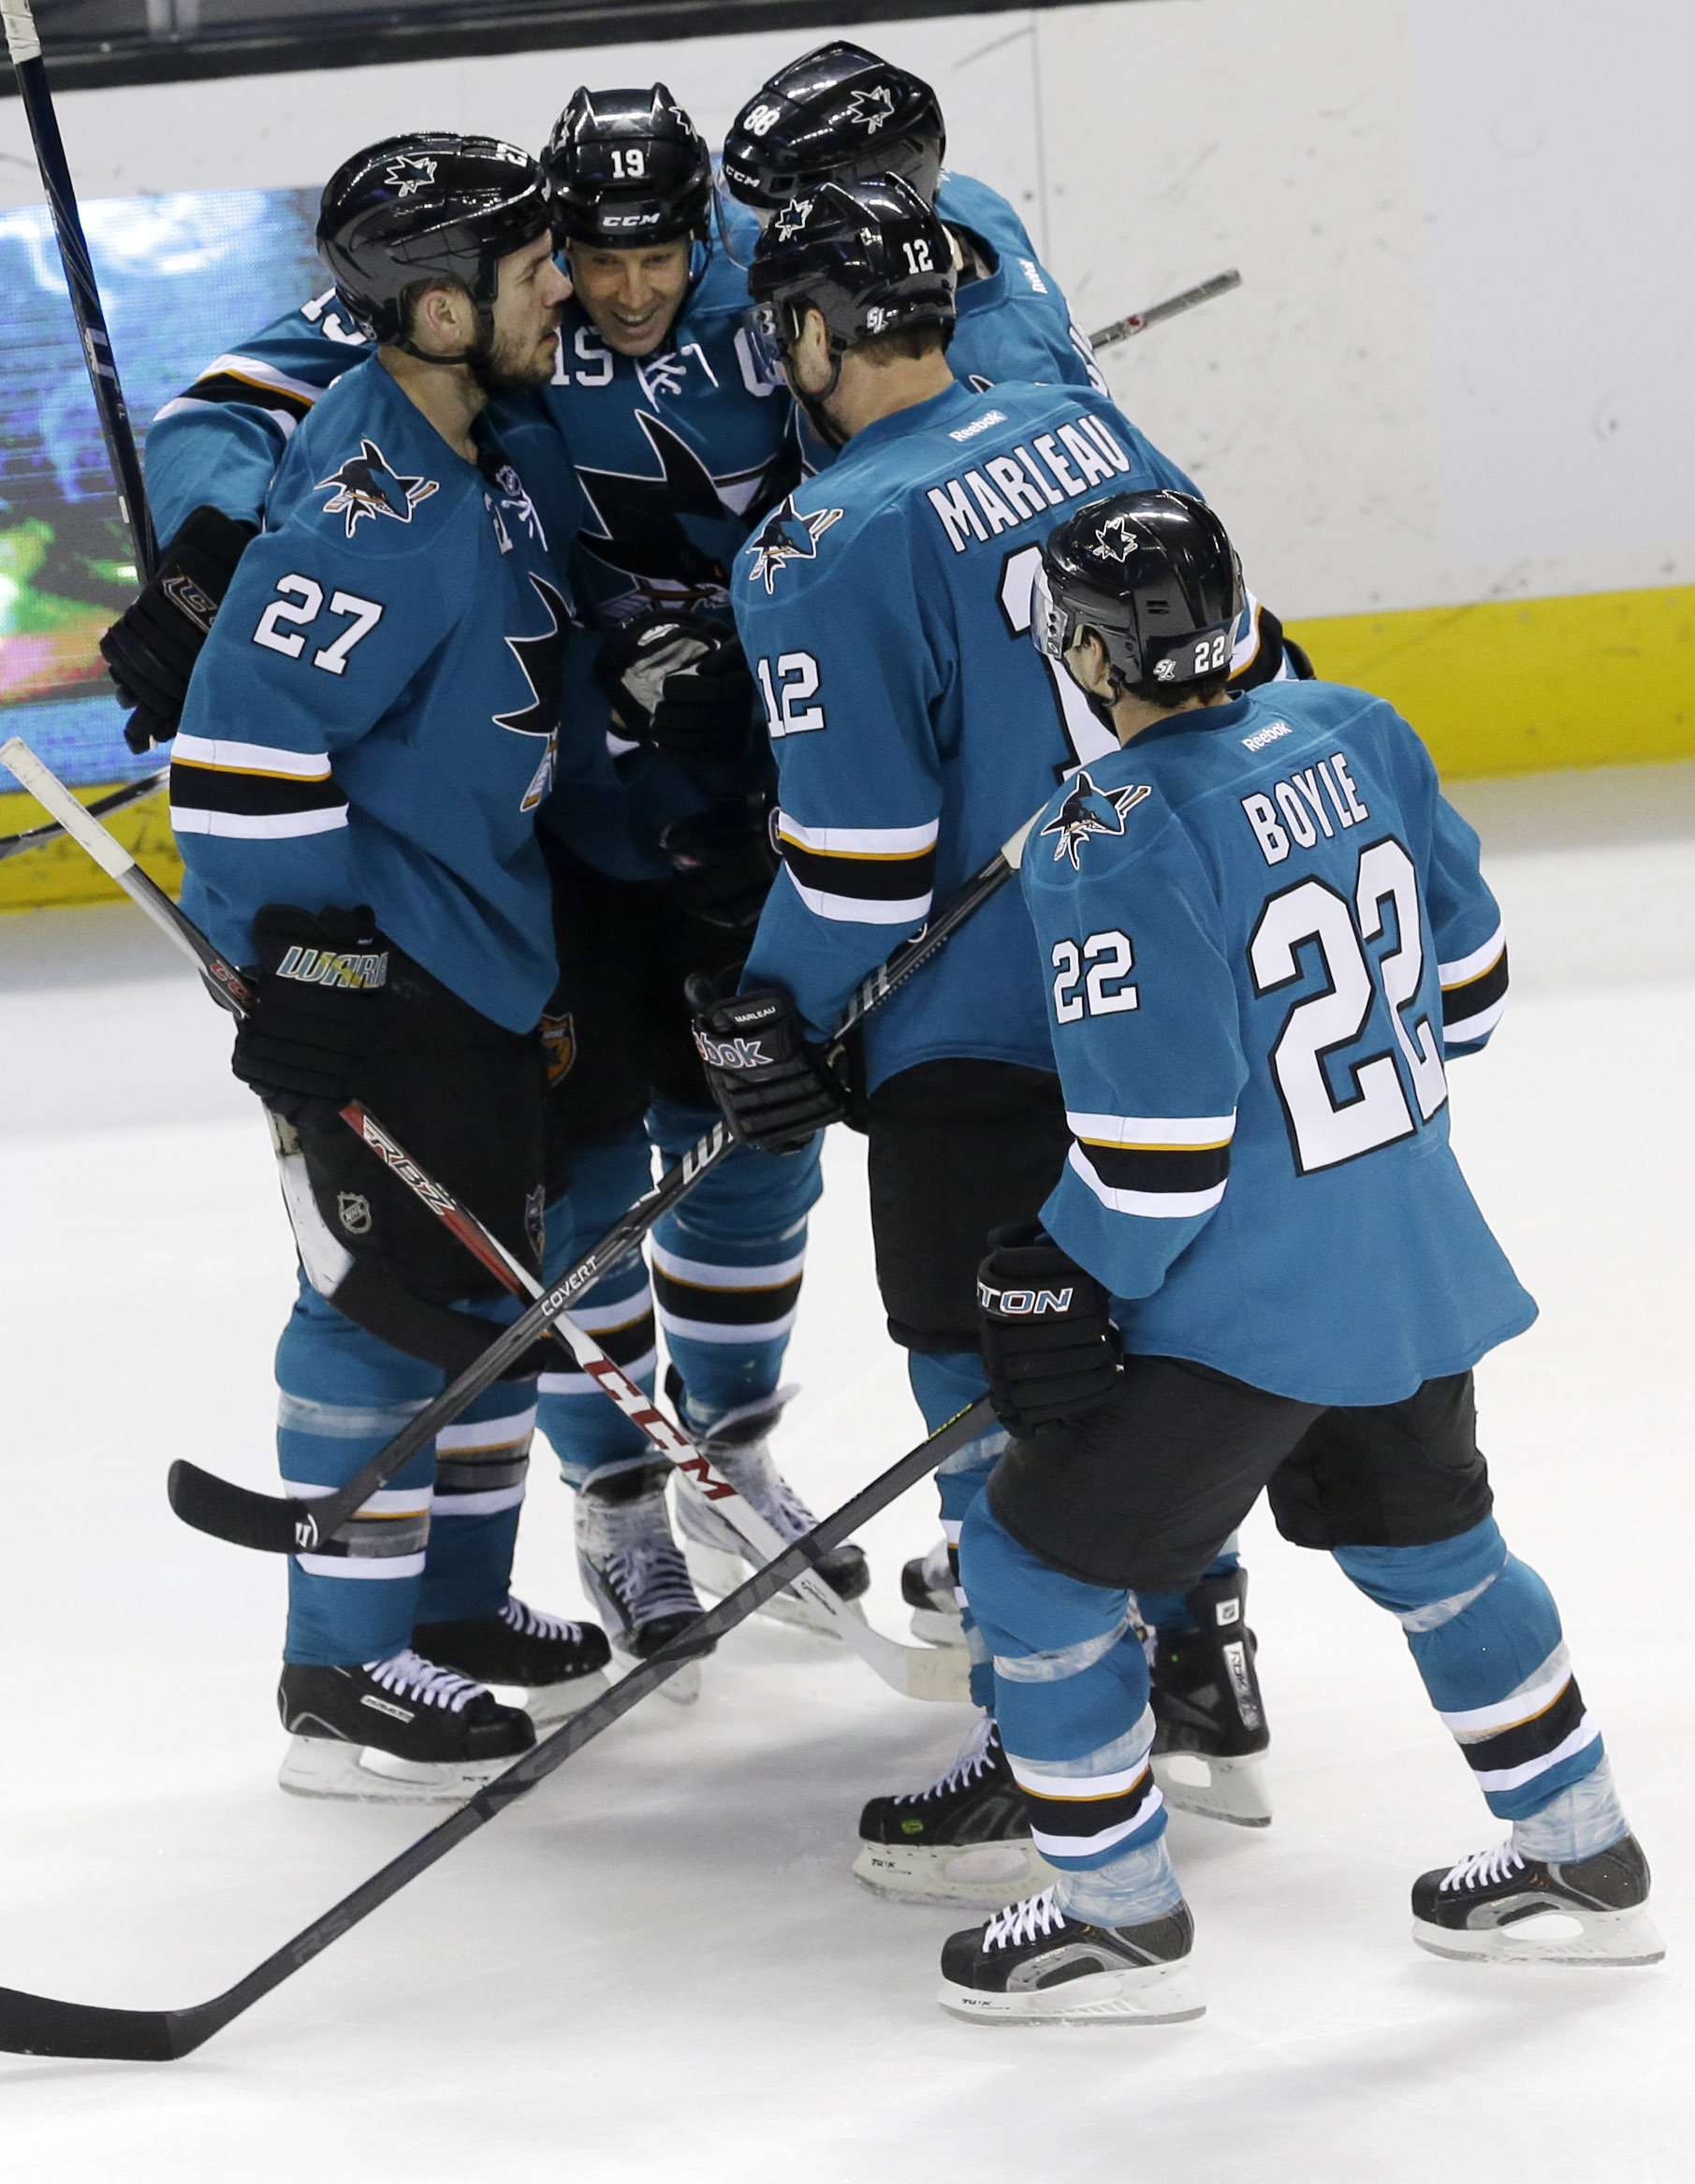 McCarthy's goal helps Sharks beat Blue Jackets 3-2